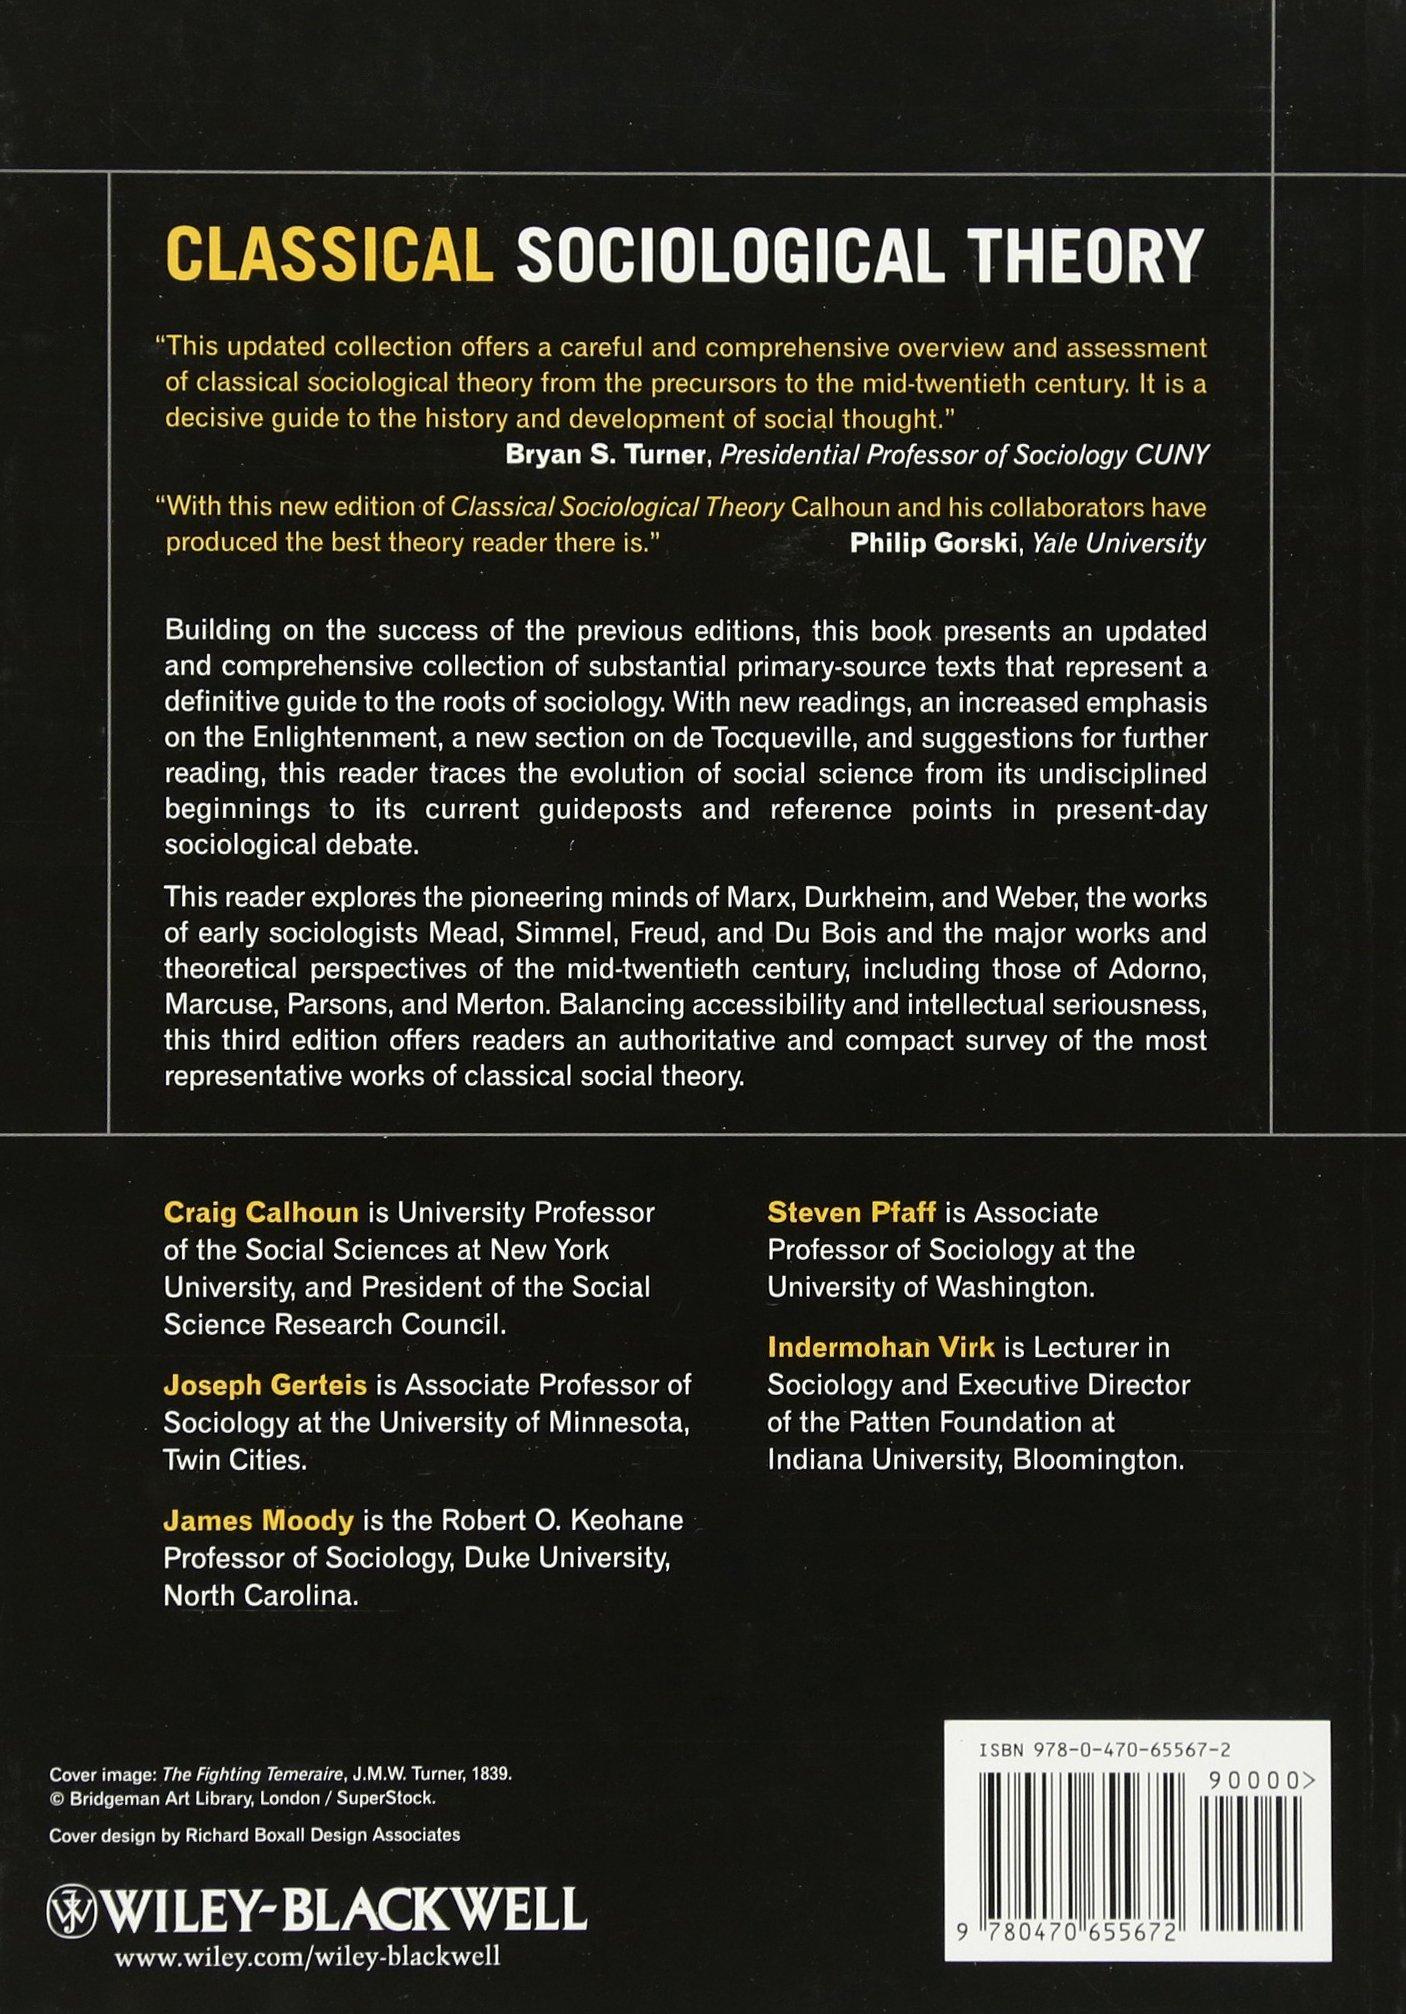 Classical Sociological Theory Craig Calhoun Joseph Gerteis James Moody Steven Pfaff Indermohan Virk 9780470655672 Books